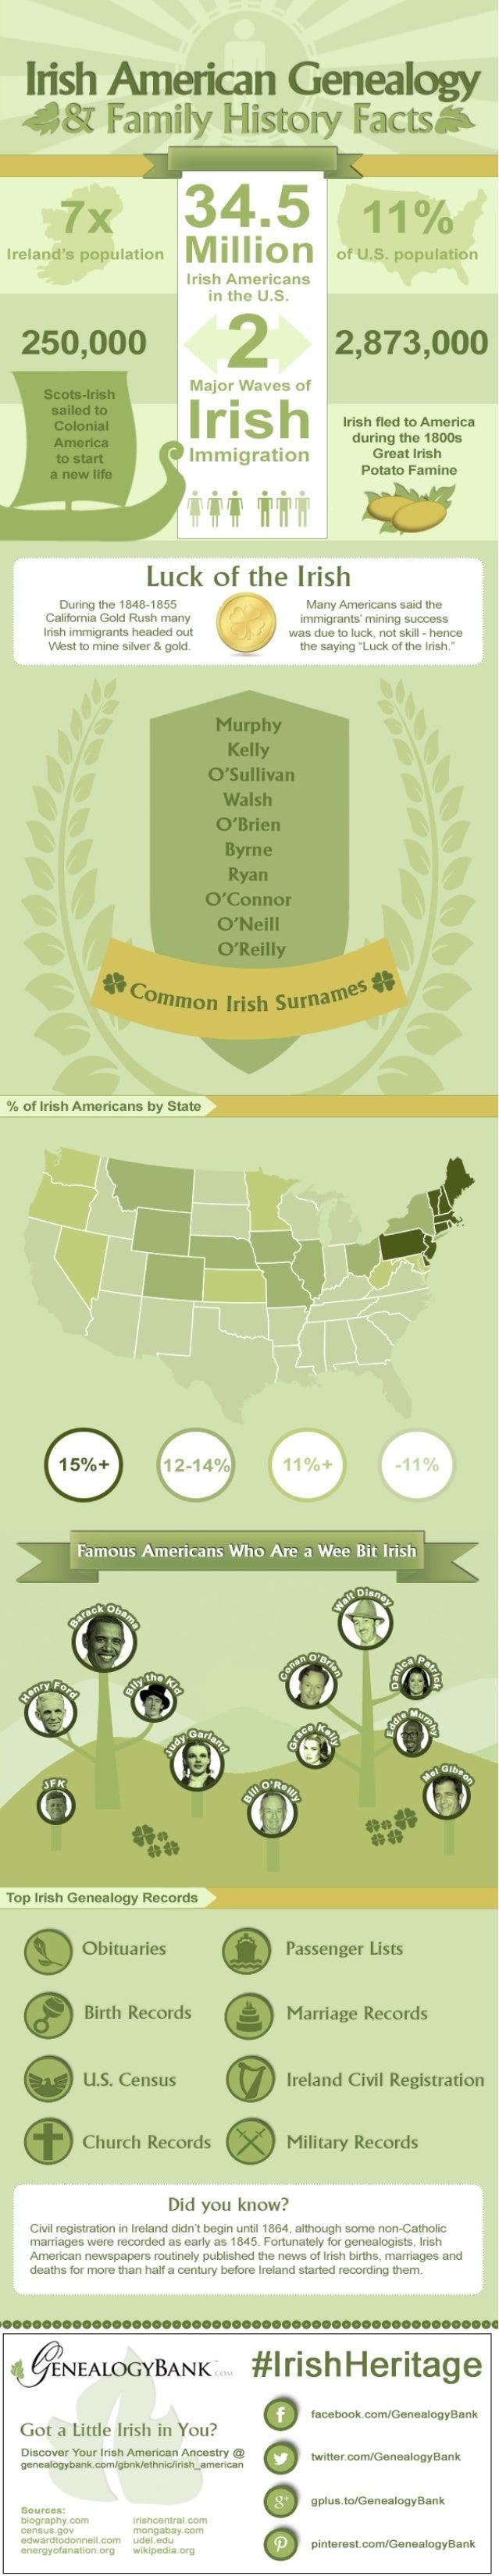 Irish American Genealogy Facts Infographic